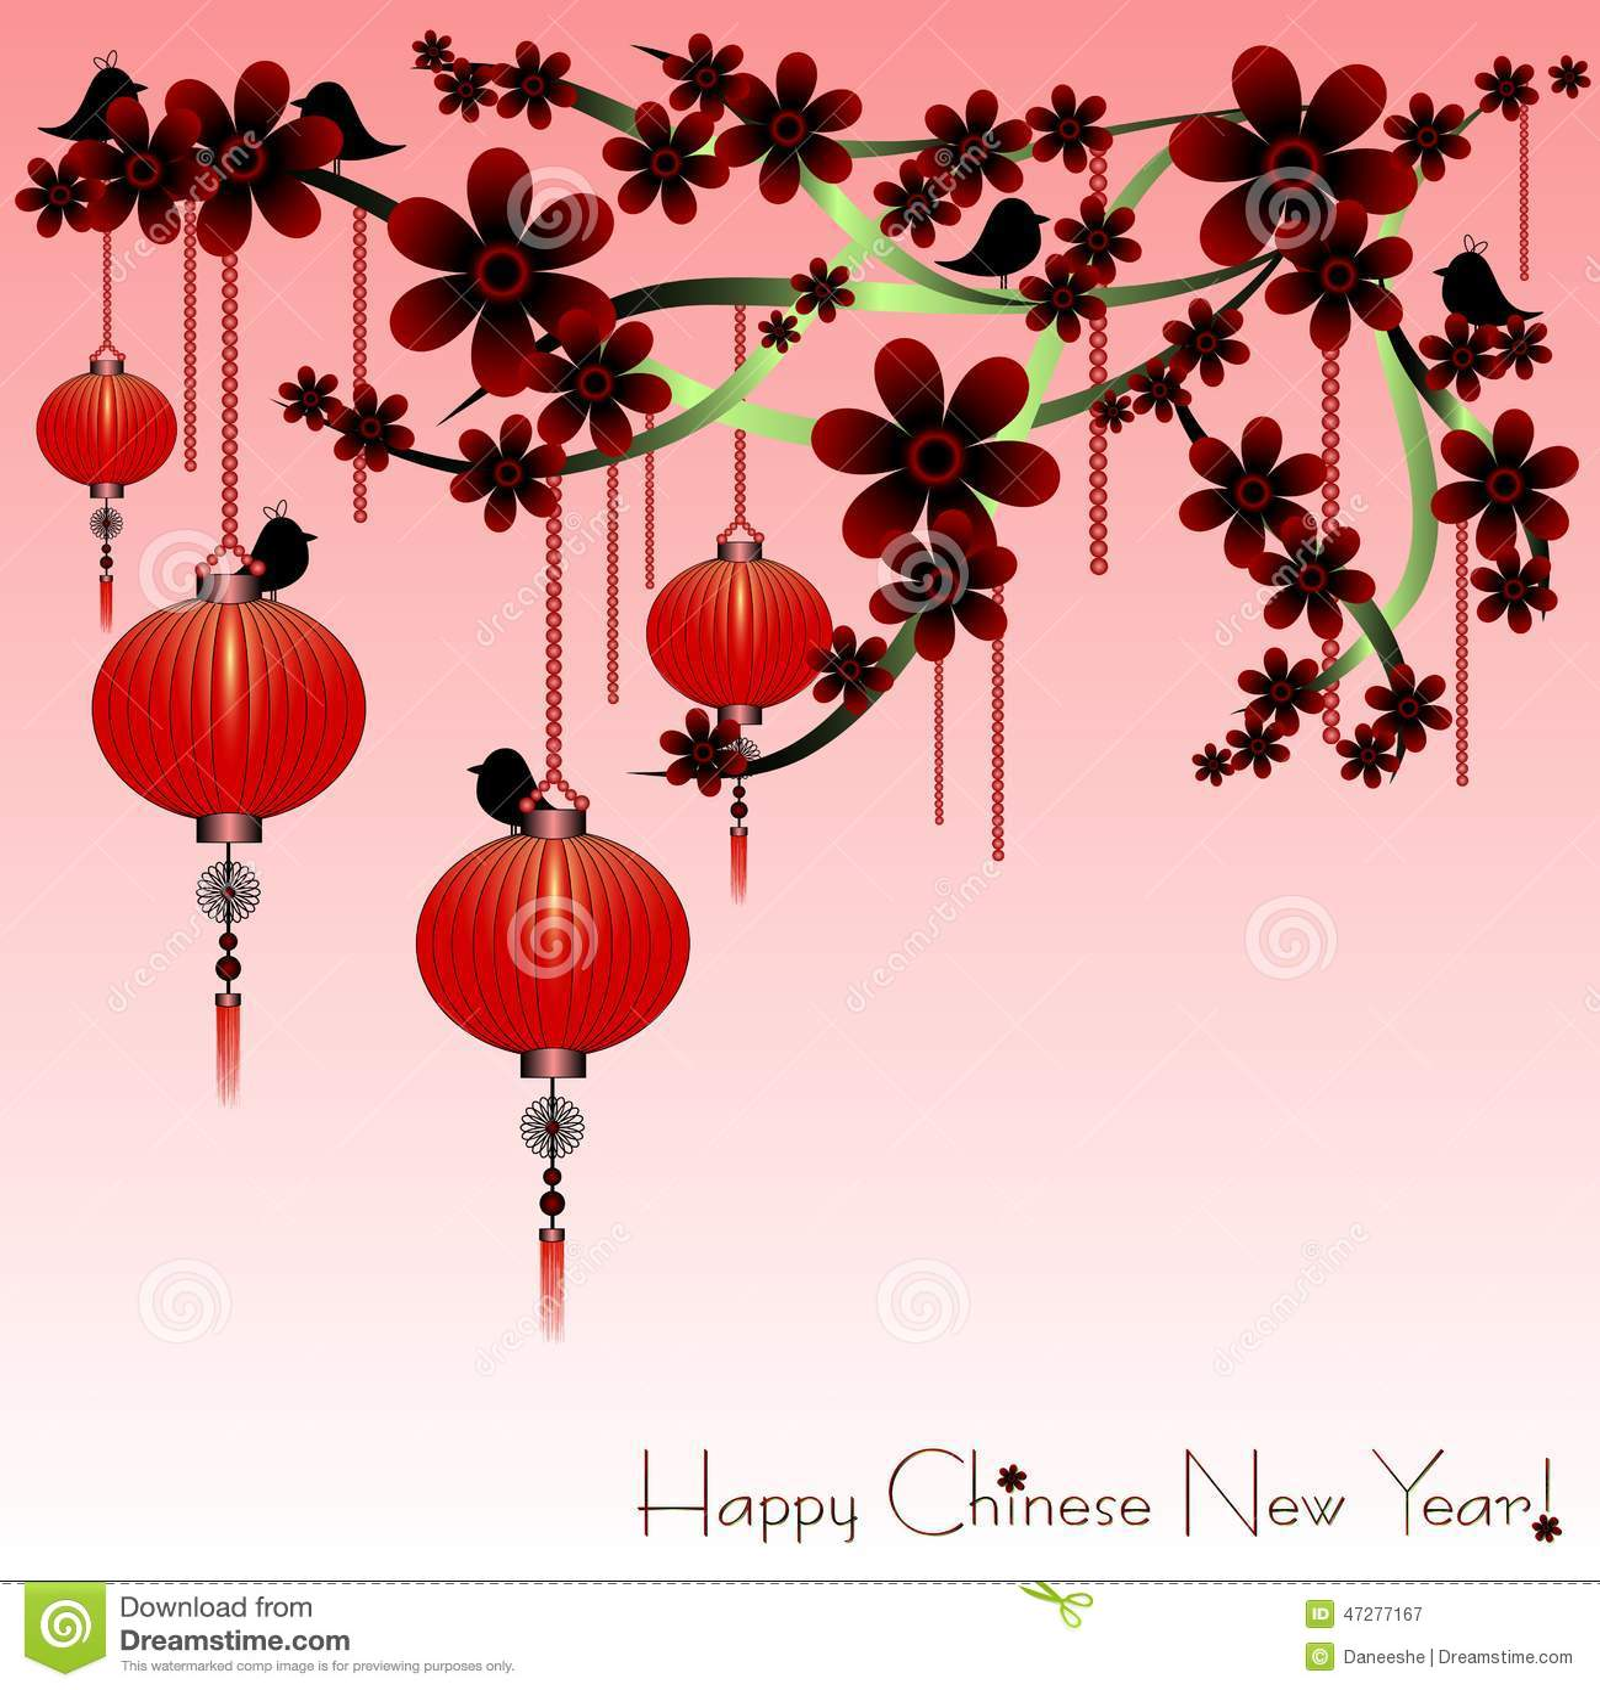 Holiday postcard to the chinese new year 2015 stock vector holiday postcard to the chinese new year 2015 design sakura kristyandbryce Choice Image